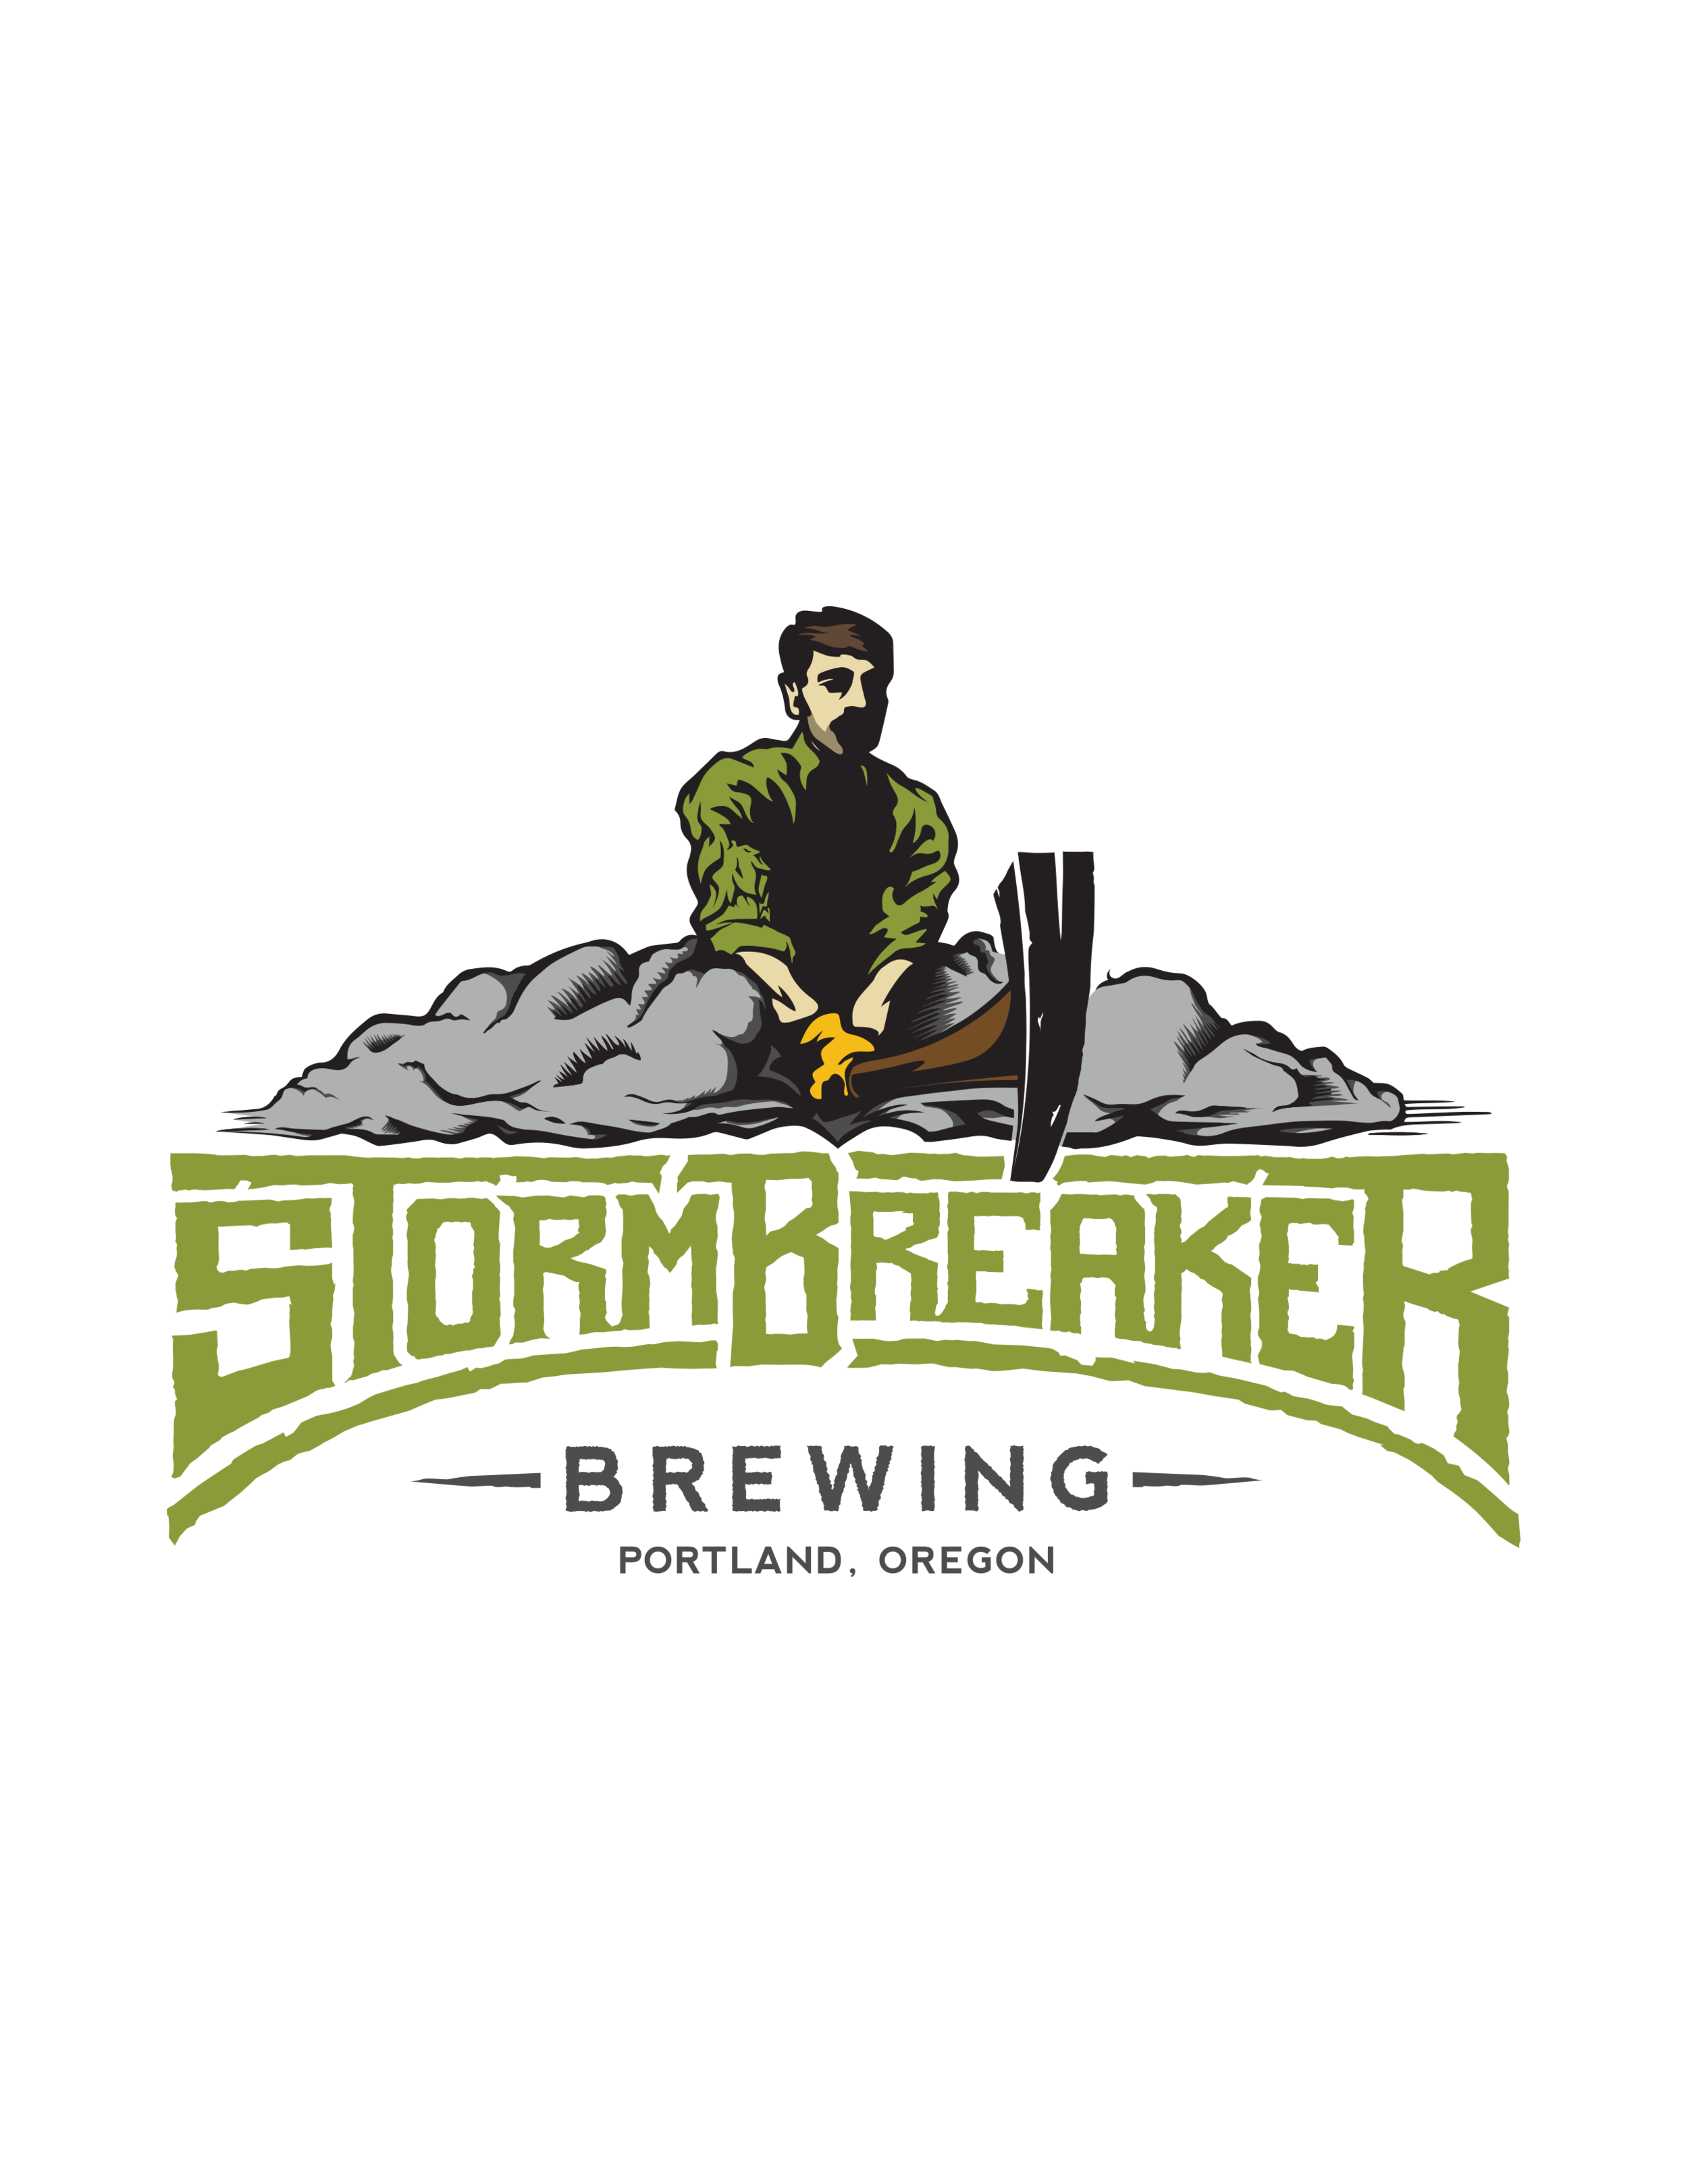 StormBreaker-No-Background.png